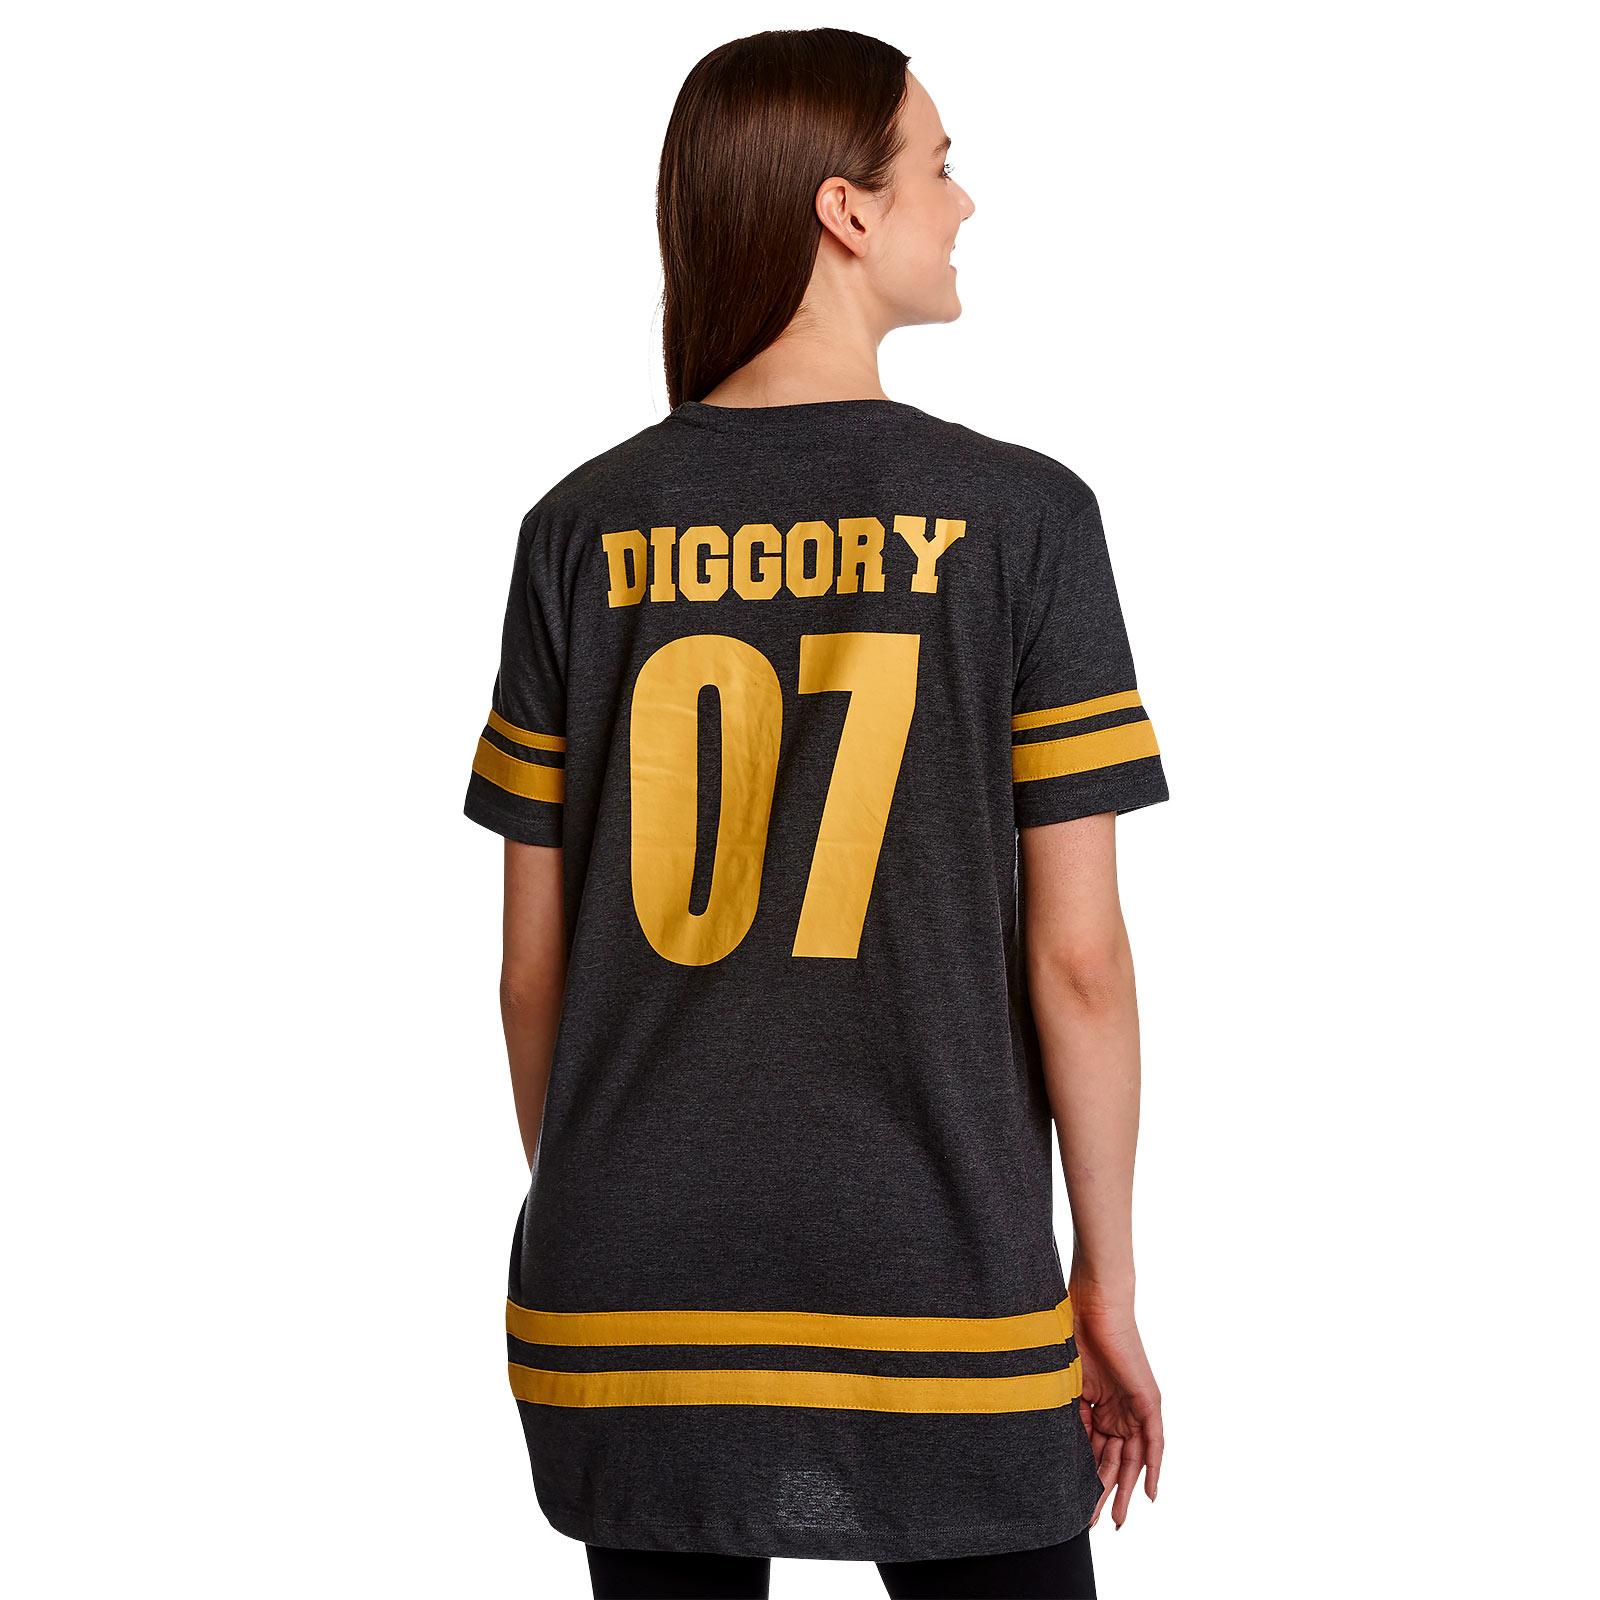 Hufflepuff Sucher Diggory Oversize T-Shirt Damen grau - Harry Potter